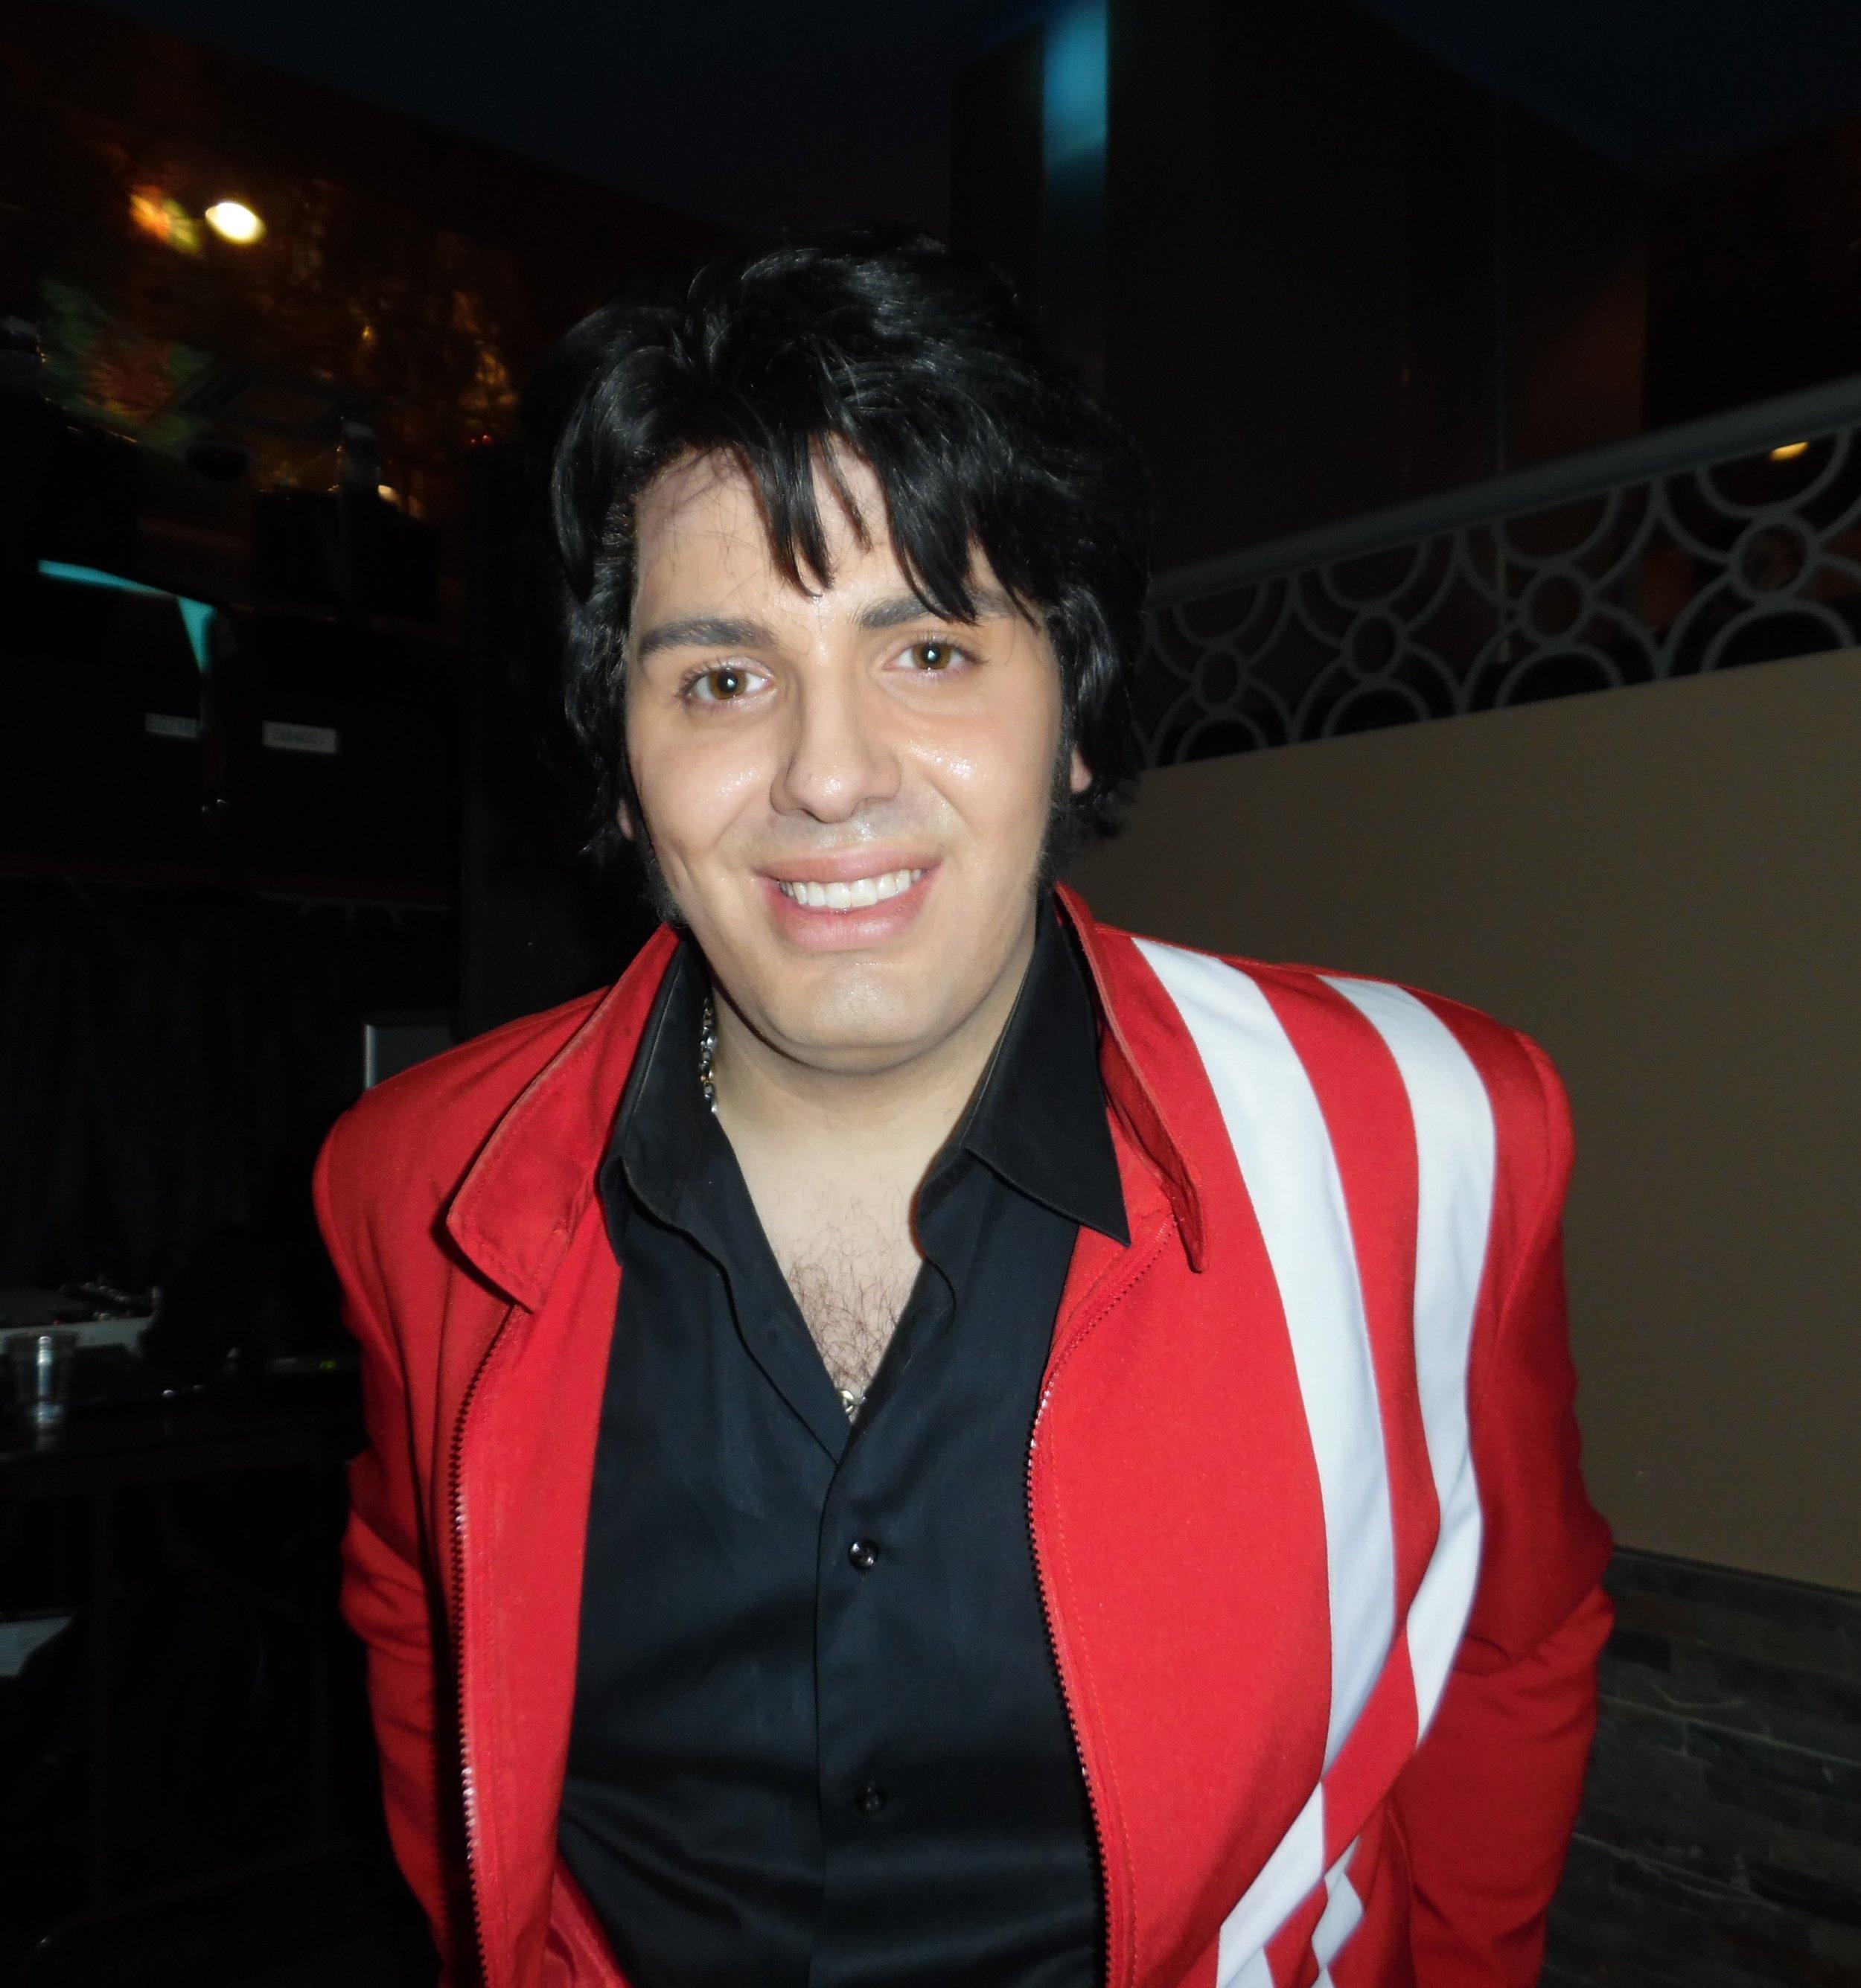 ETA  Bruno Nesci , Flamboro Downs, January 5th, 2018...cold night, warm audience, and hot entertainment!